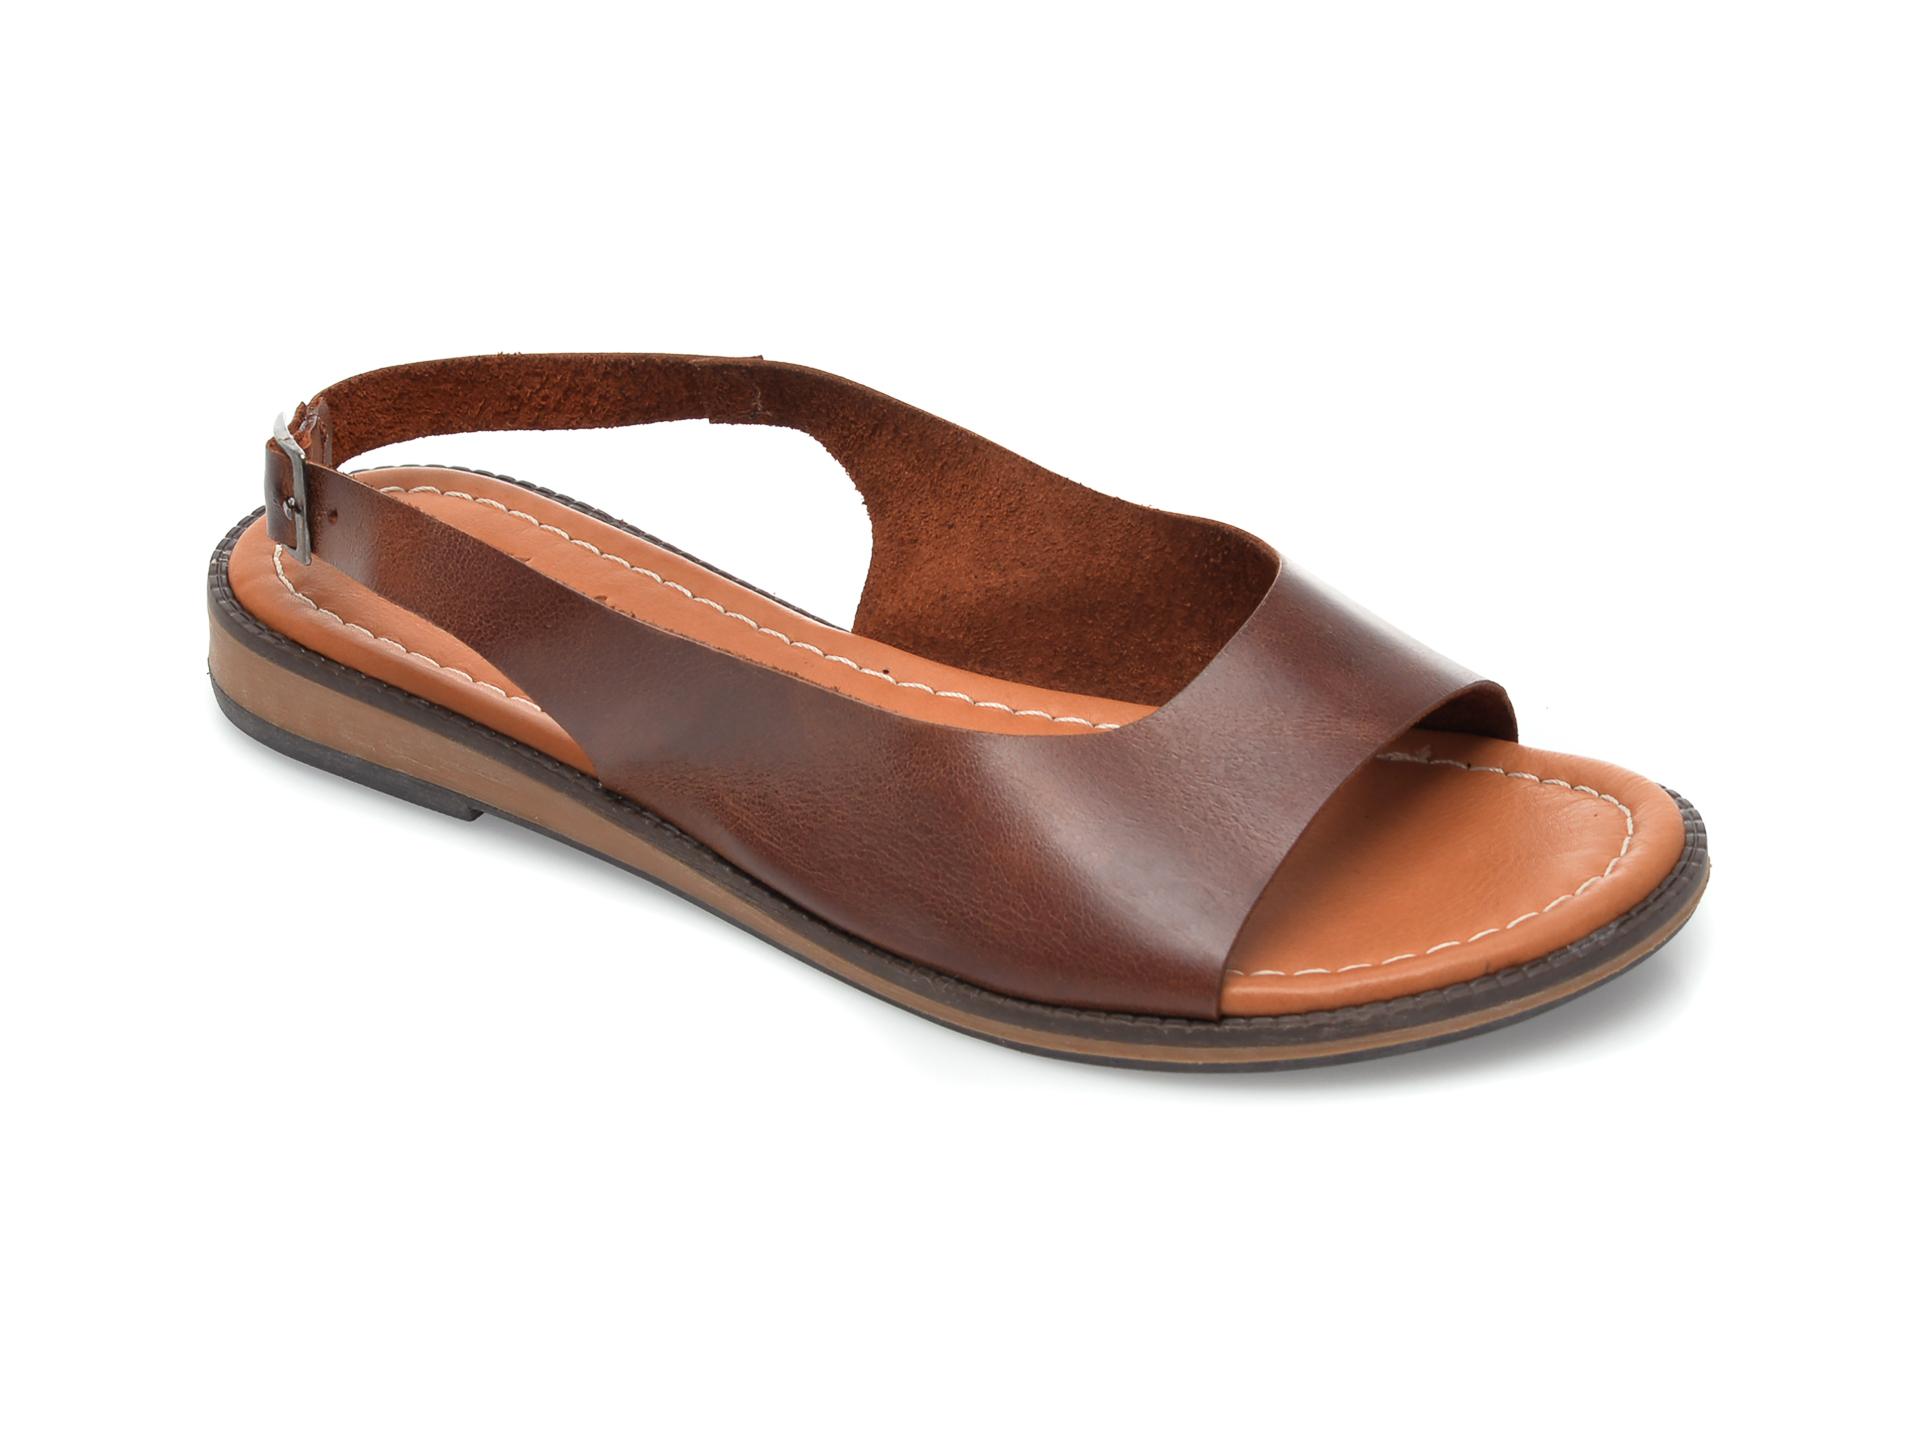 Sandale FLAVIA PASSINI maro, 103, din piele naturala imagine otter.ro 2021